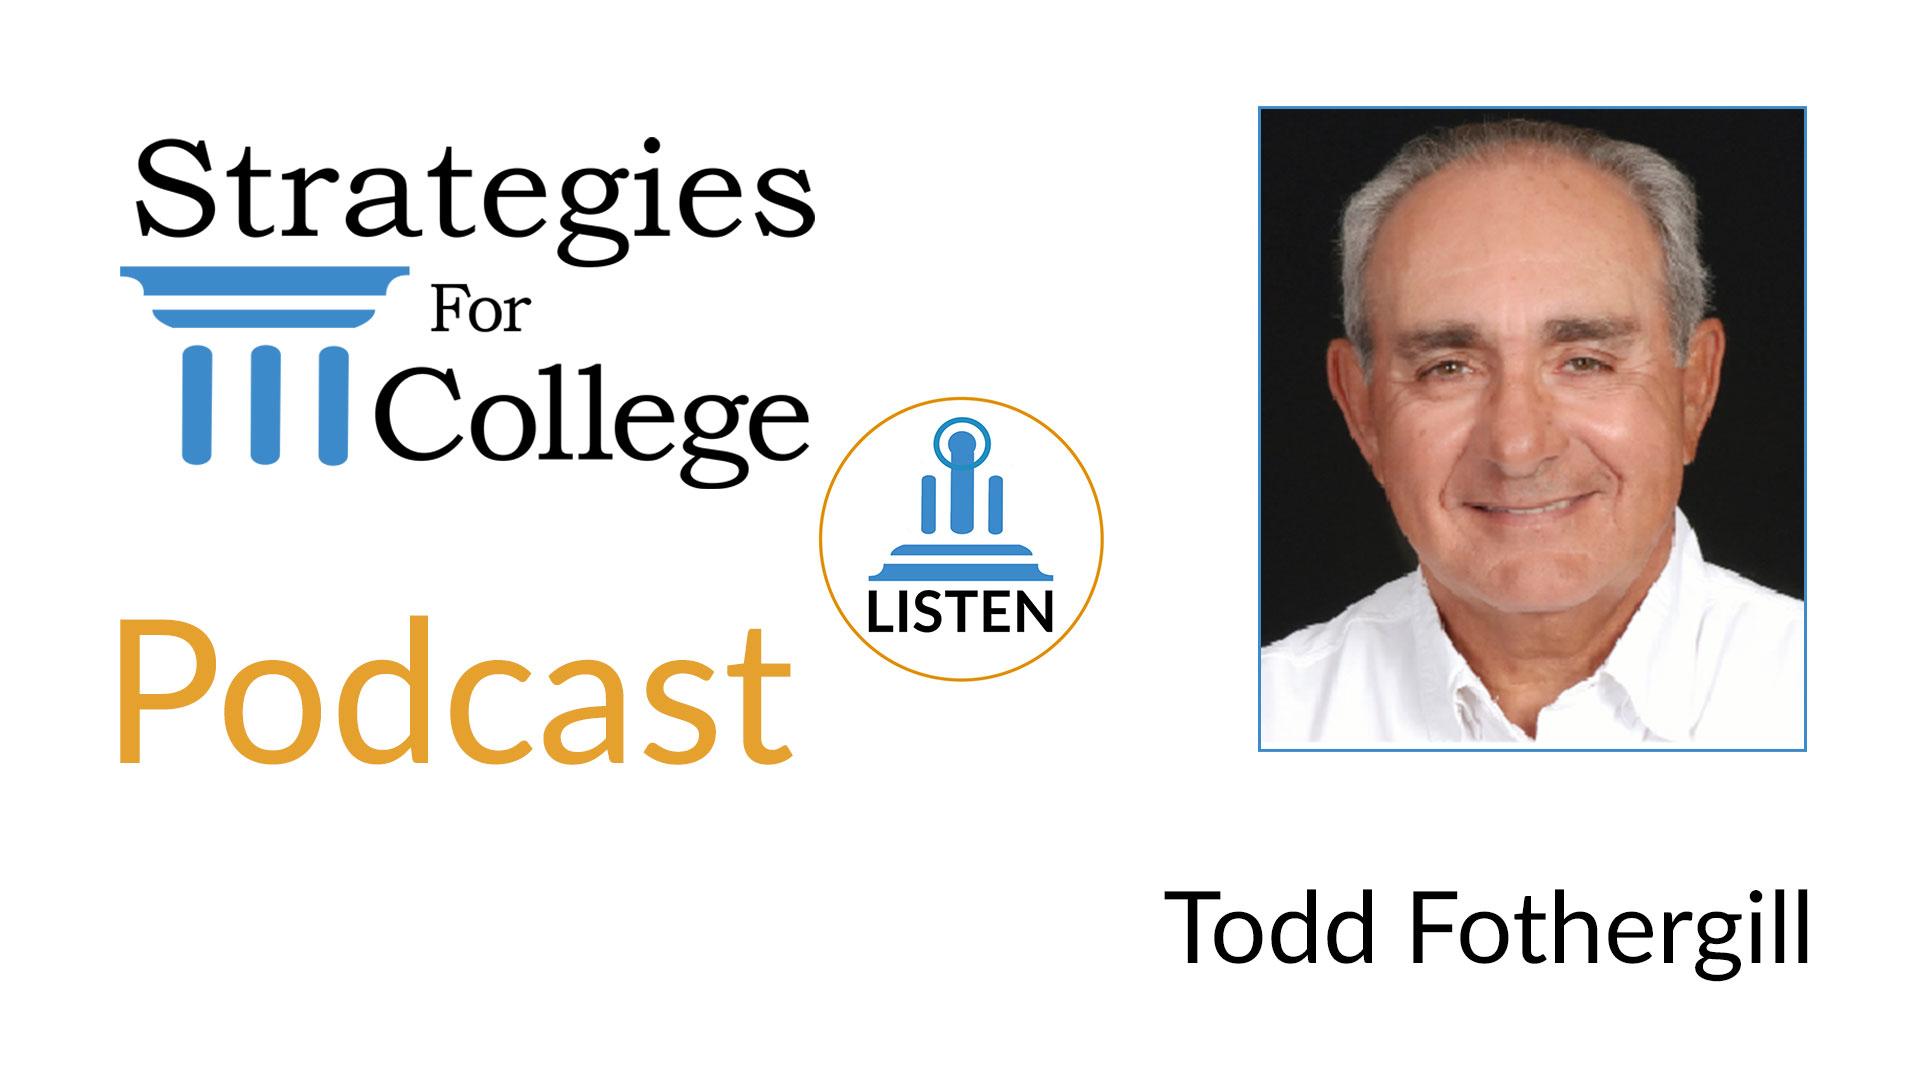 Podcast: Todd Fothergill